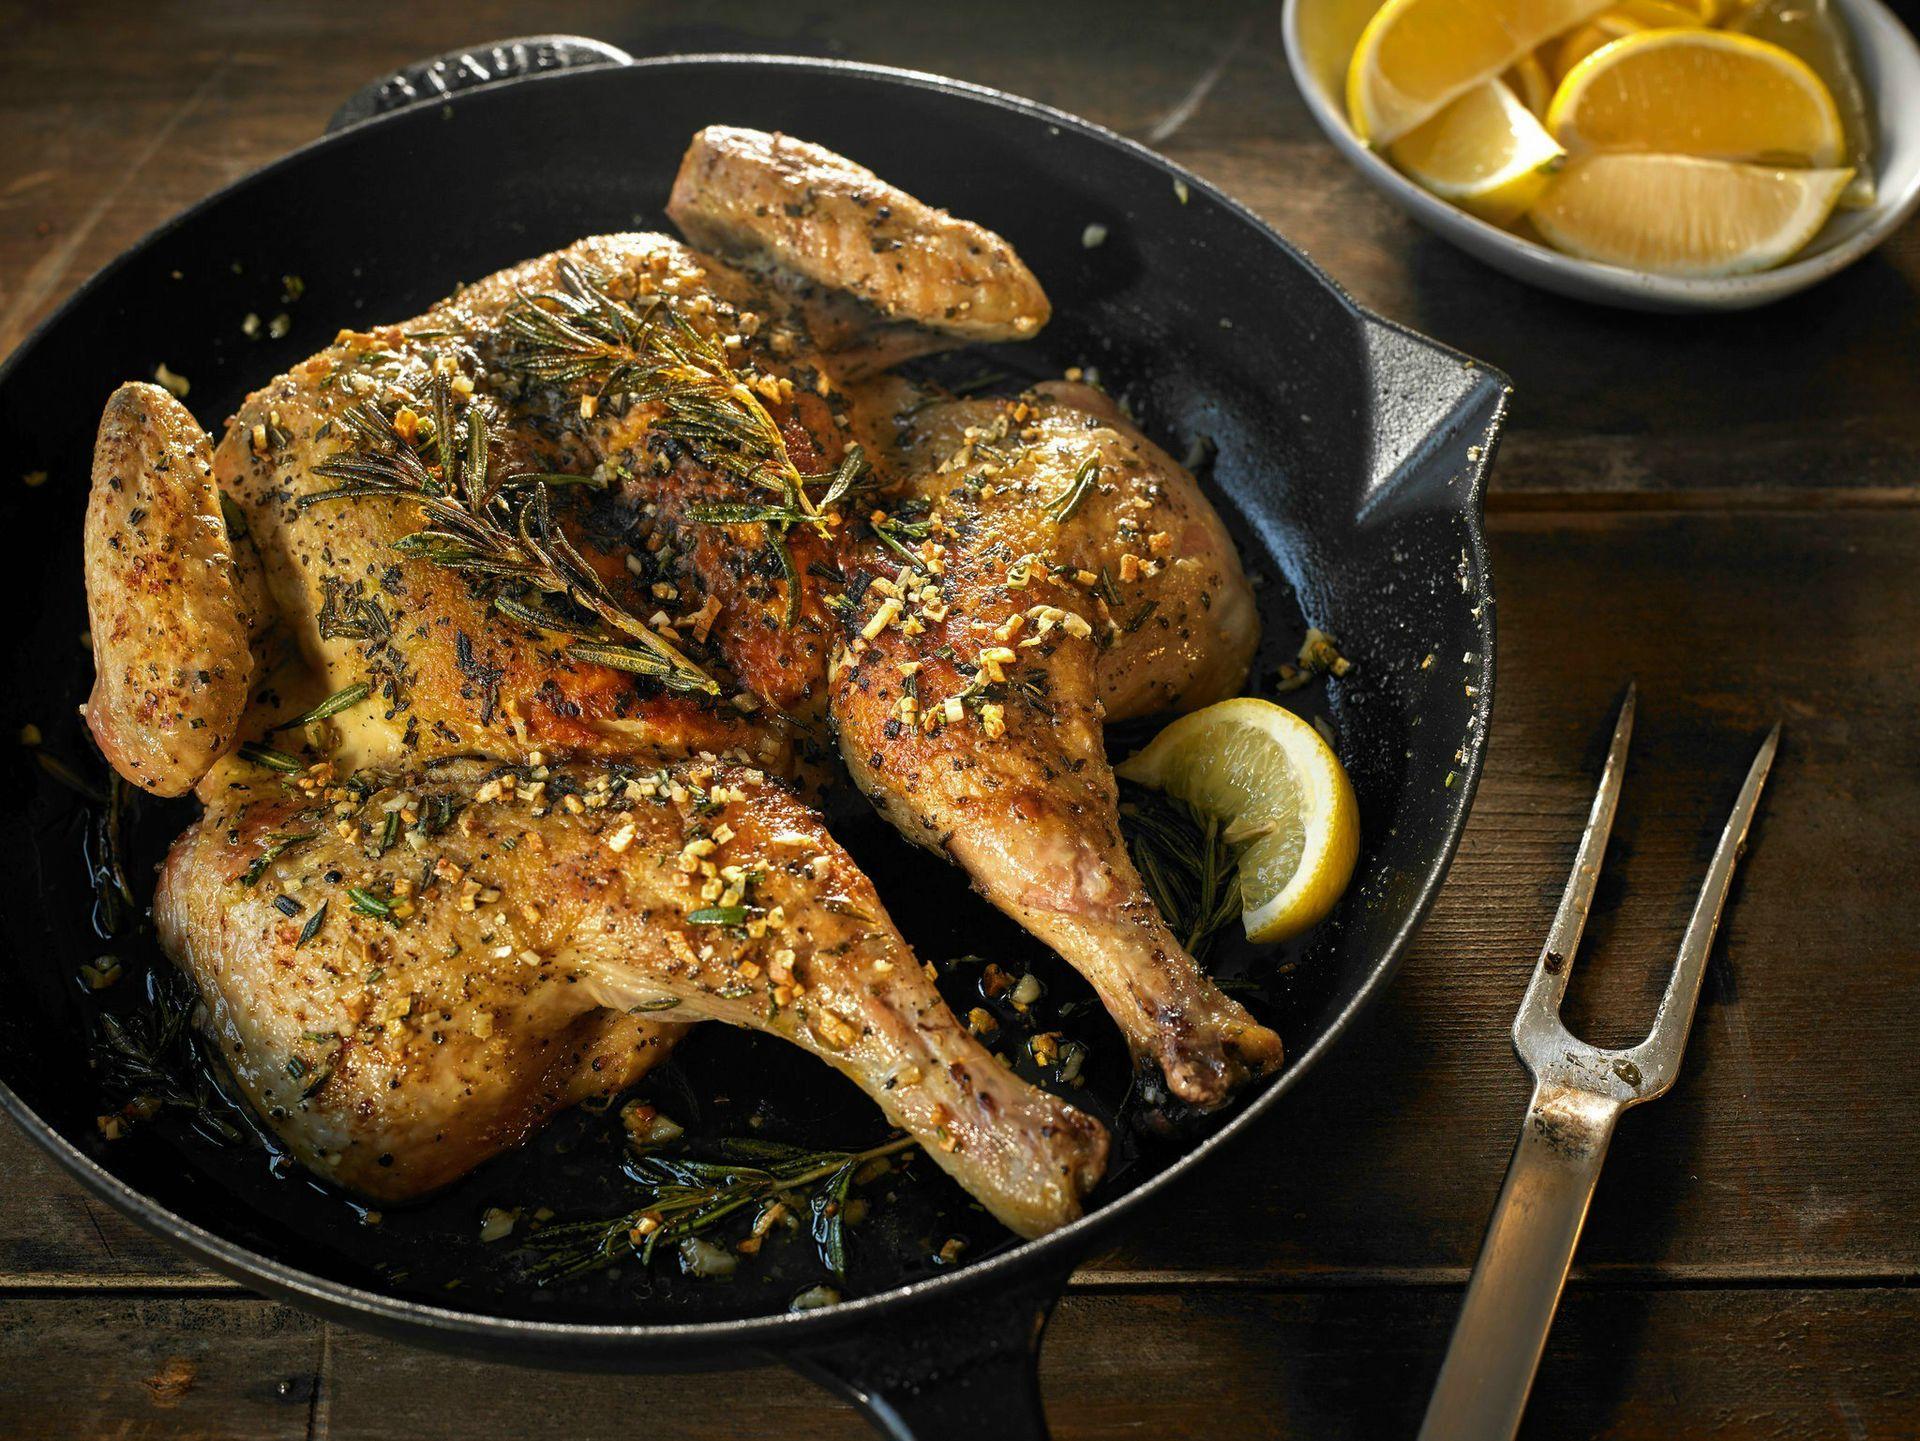 01cooking_chicken1-superjumbo-cooking